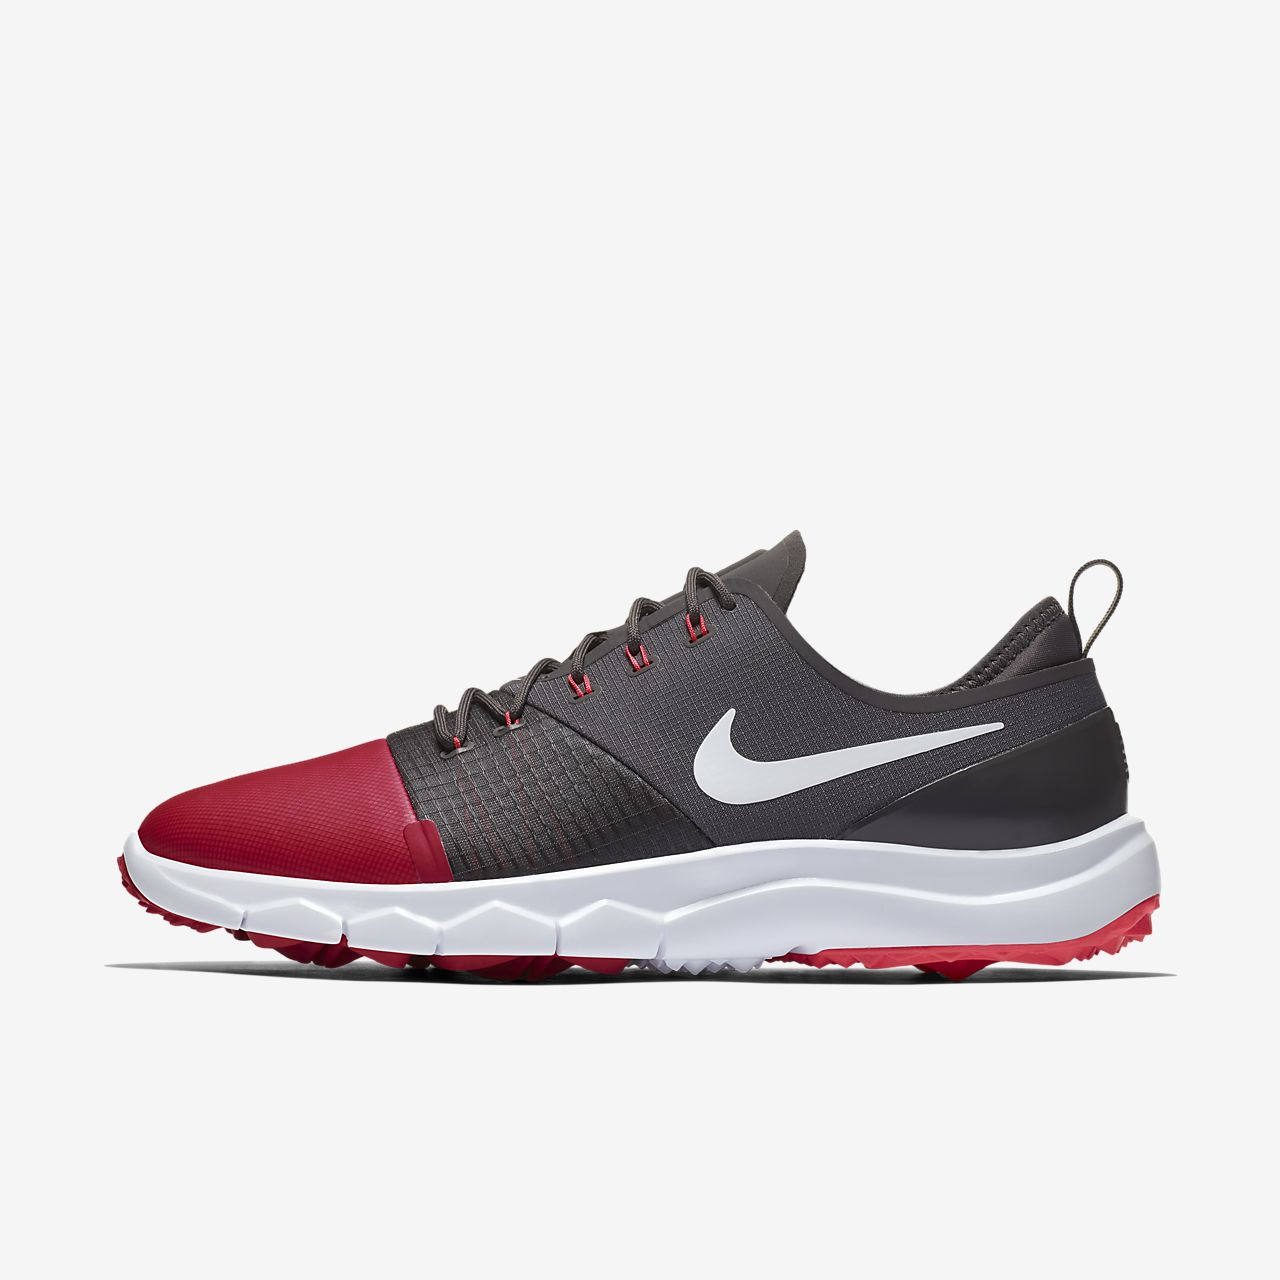 Damskie buty do golfa Nike FI Impact 3